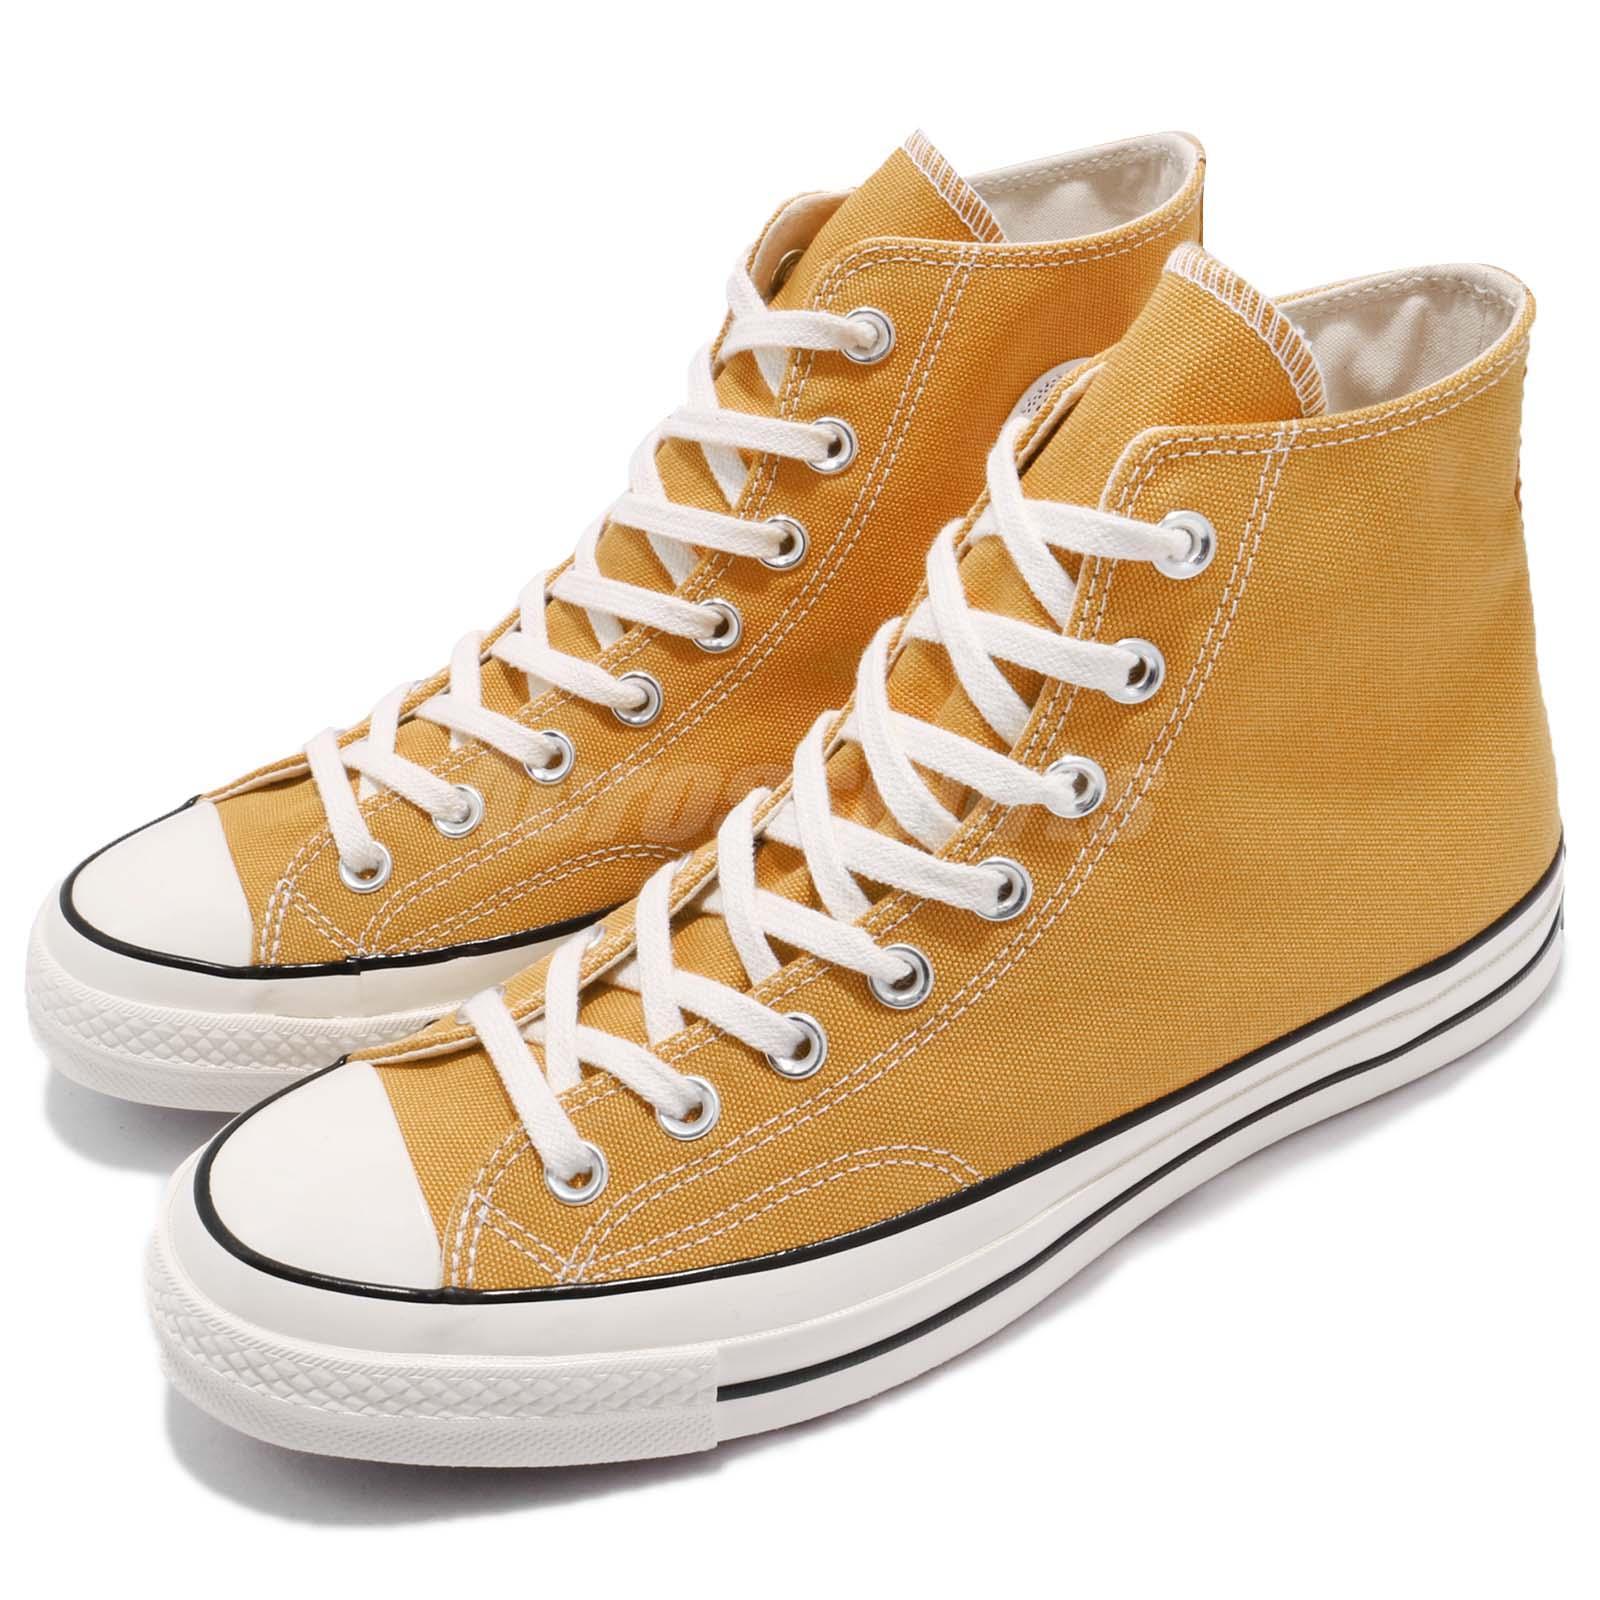 0d103d4abf99 Details about Converse First String Chuck Taylor All Star 1970 High Yellow  Men Women 162054C